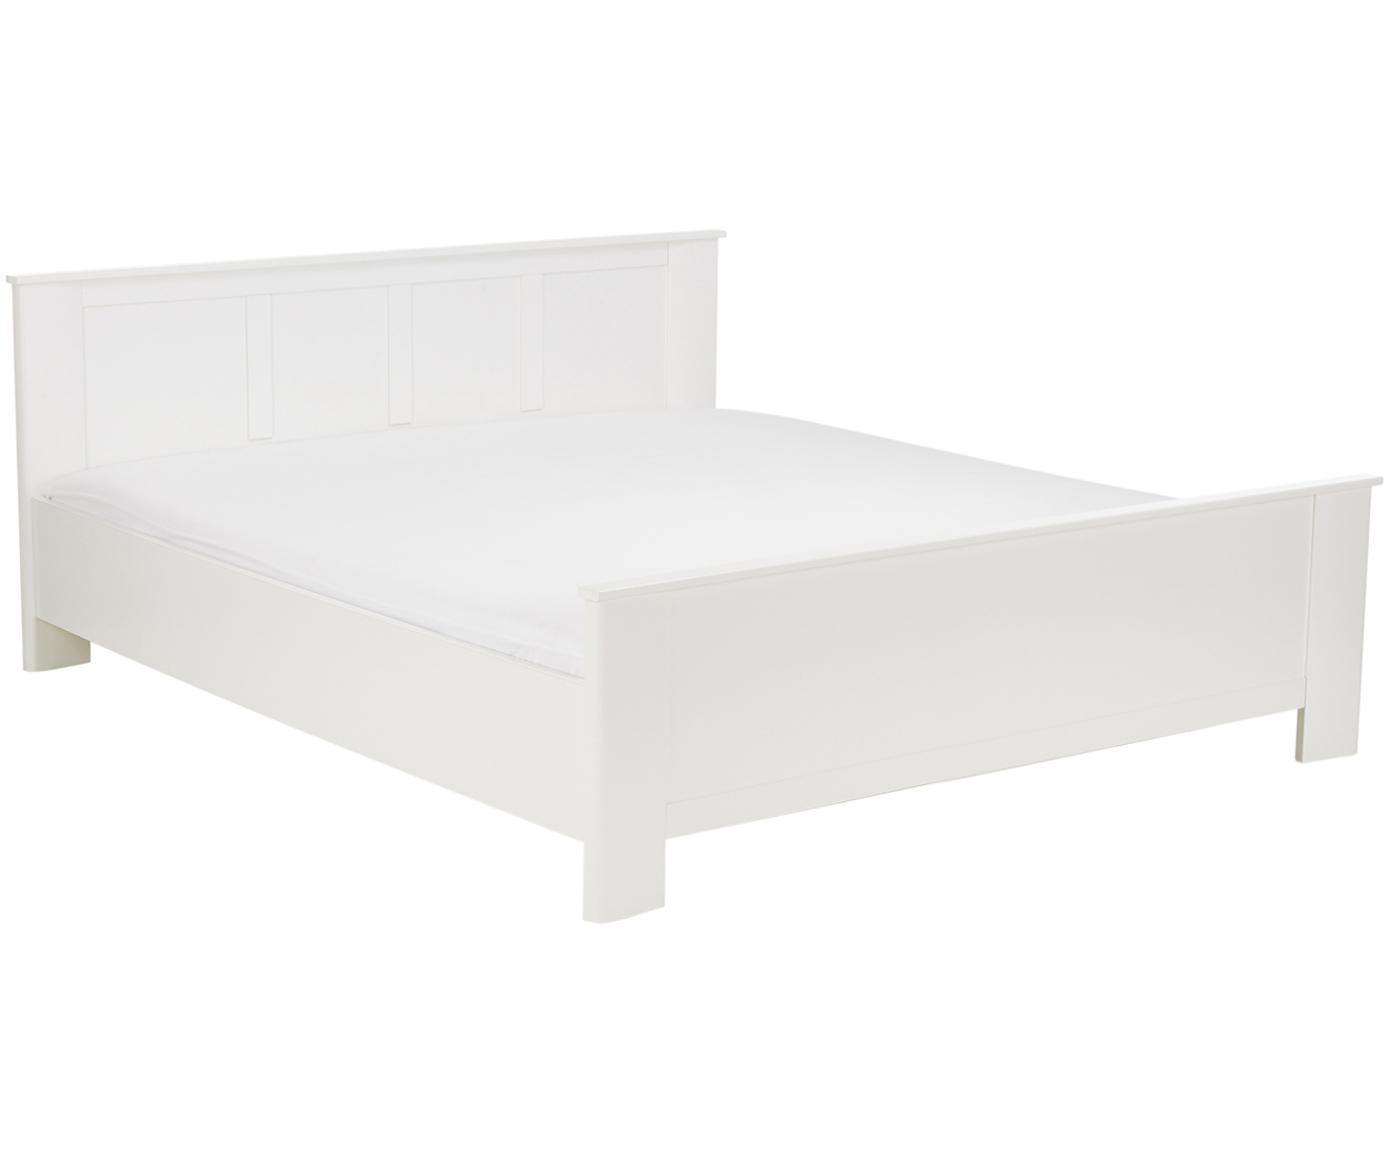 Weißes Holzbett Chalet, Spanplatte, foliert, Weiß, 180 x 200 cm